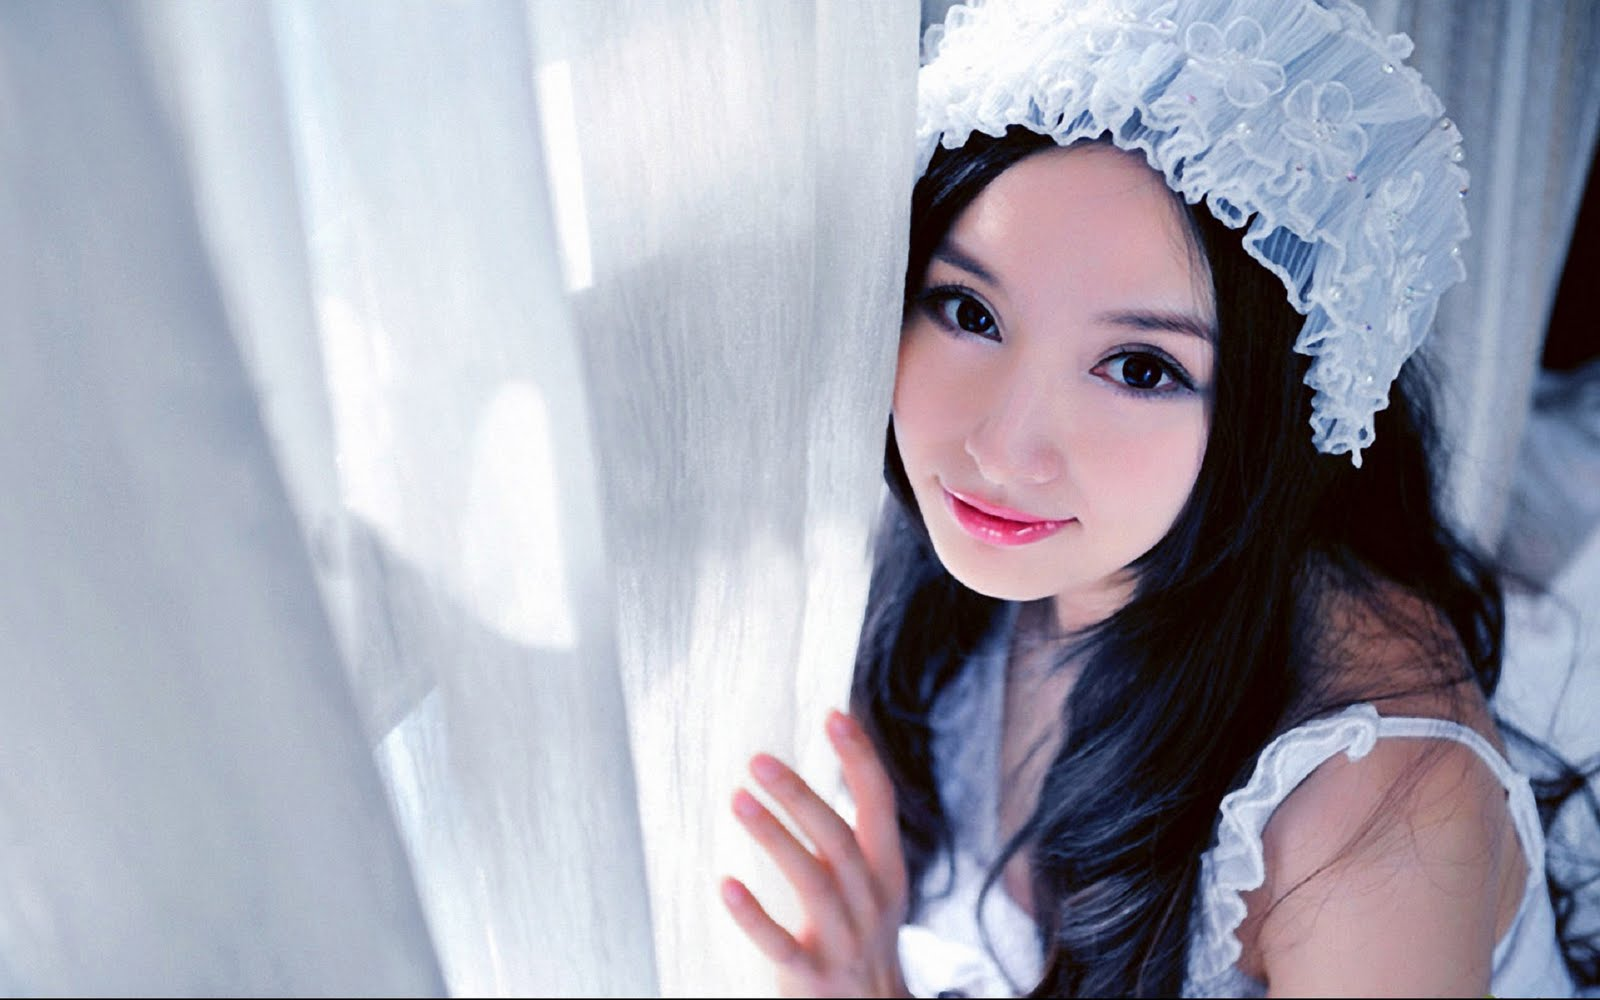 http://2.bp.blogspot.com/-tPBGK023e9Y/Td_3PCc0eXI/AAAAAAAAA0k/Ule9uvfHJZI/s1600/lin-ketong-cute-girl-wallpaper_1598x1064_84125.jpg